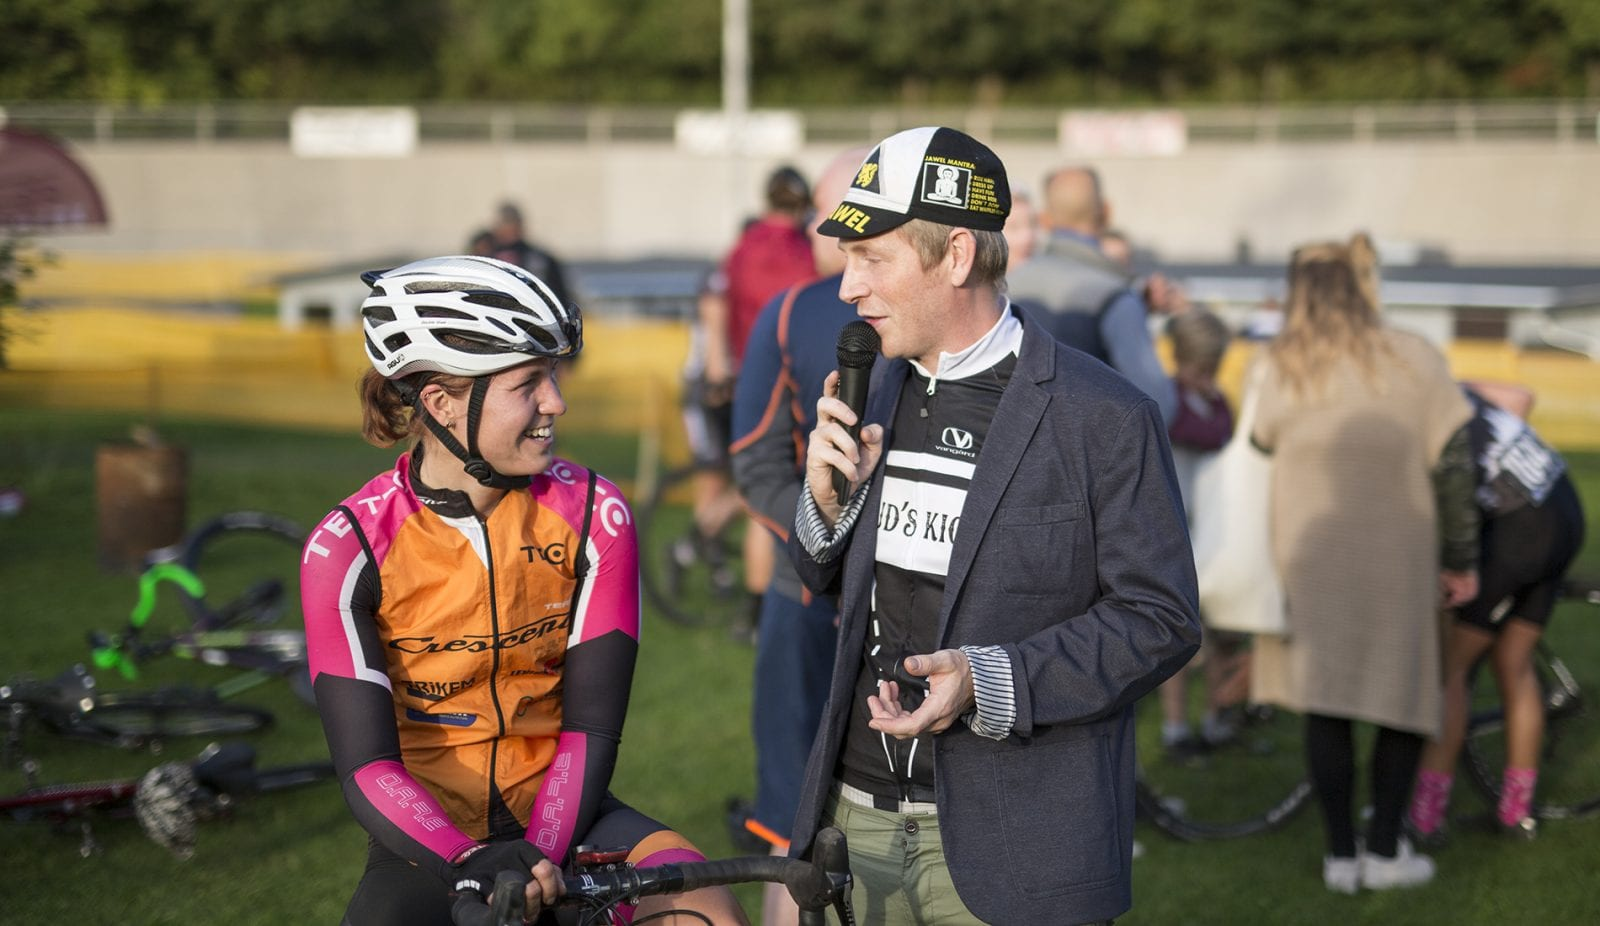 Grote Prijs Uggi Kaldan AltomCykling.dk